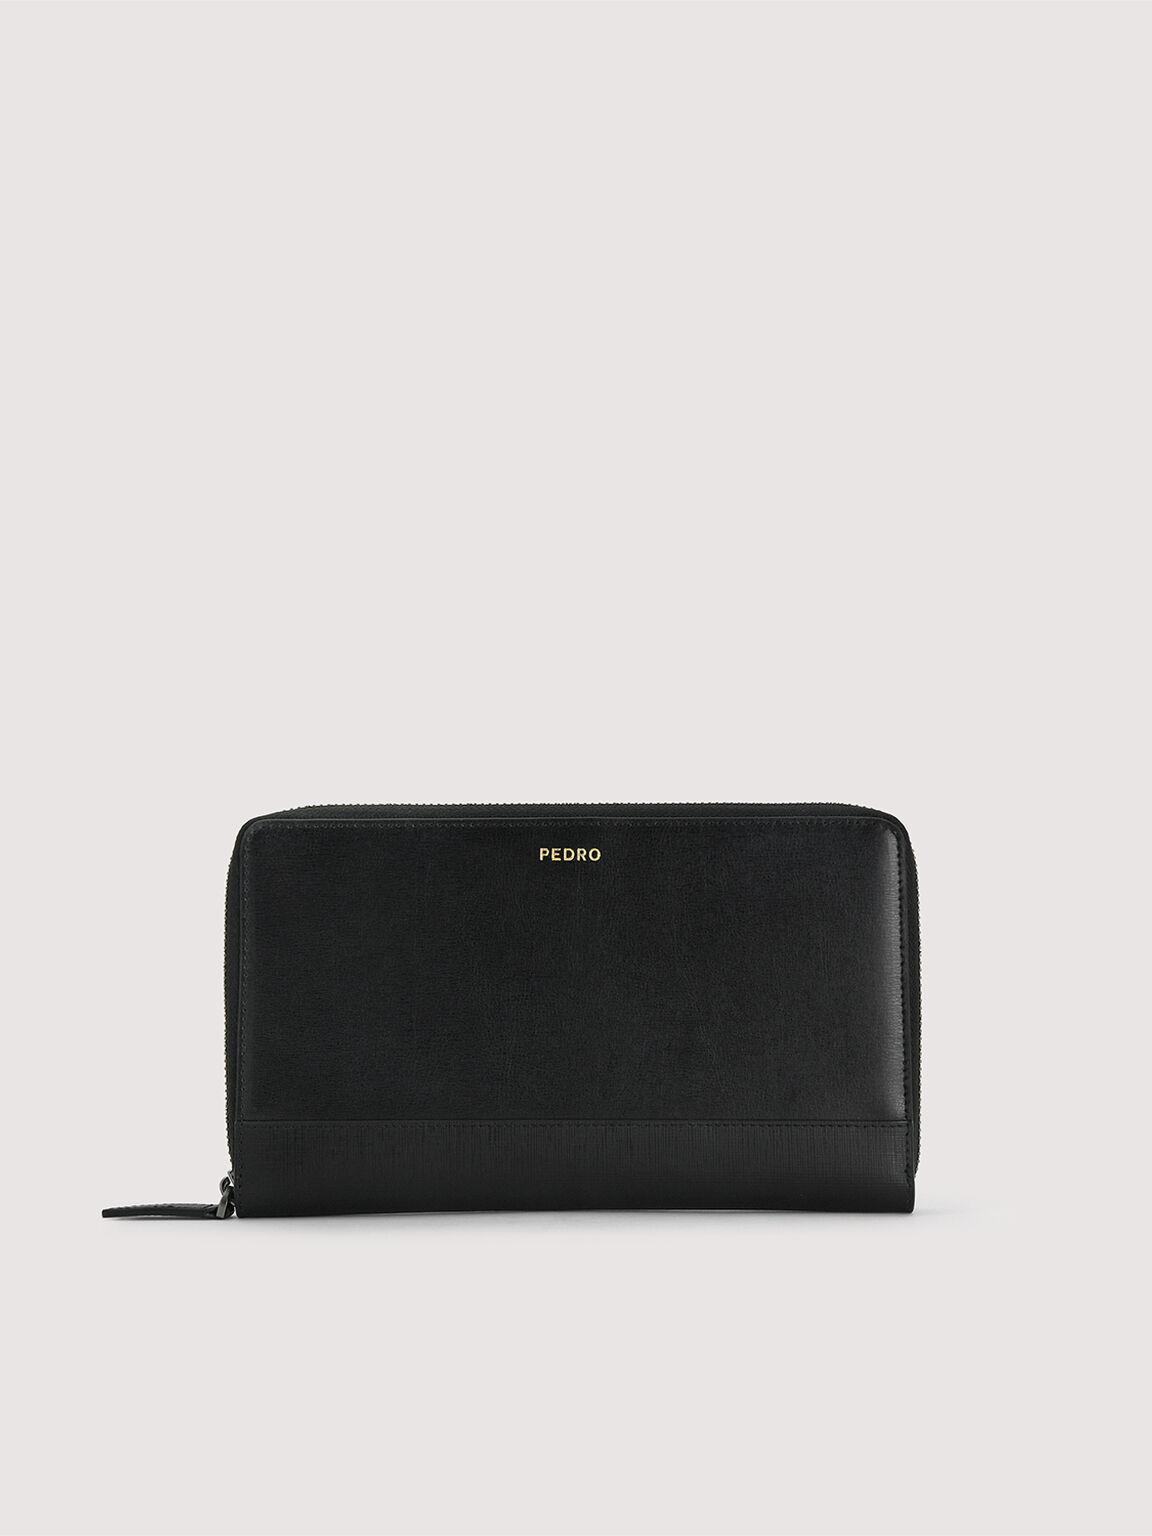 Leather Zip-Around Travel Organizer, Black, hi-res